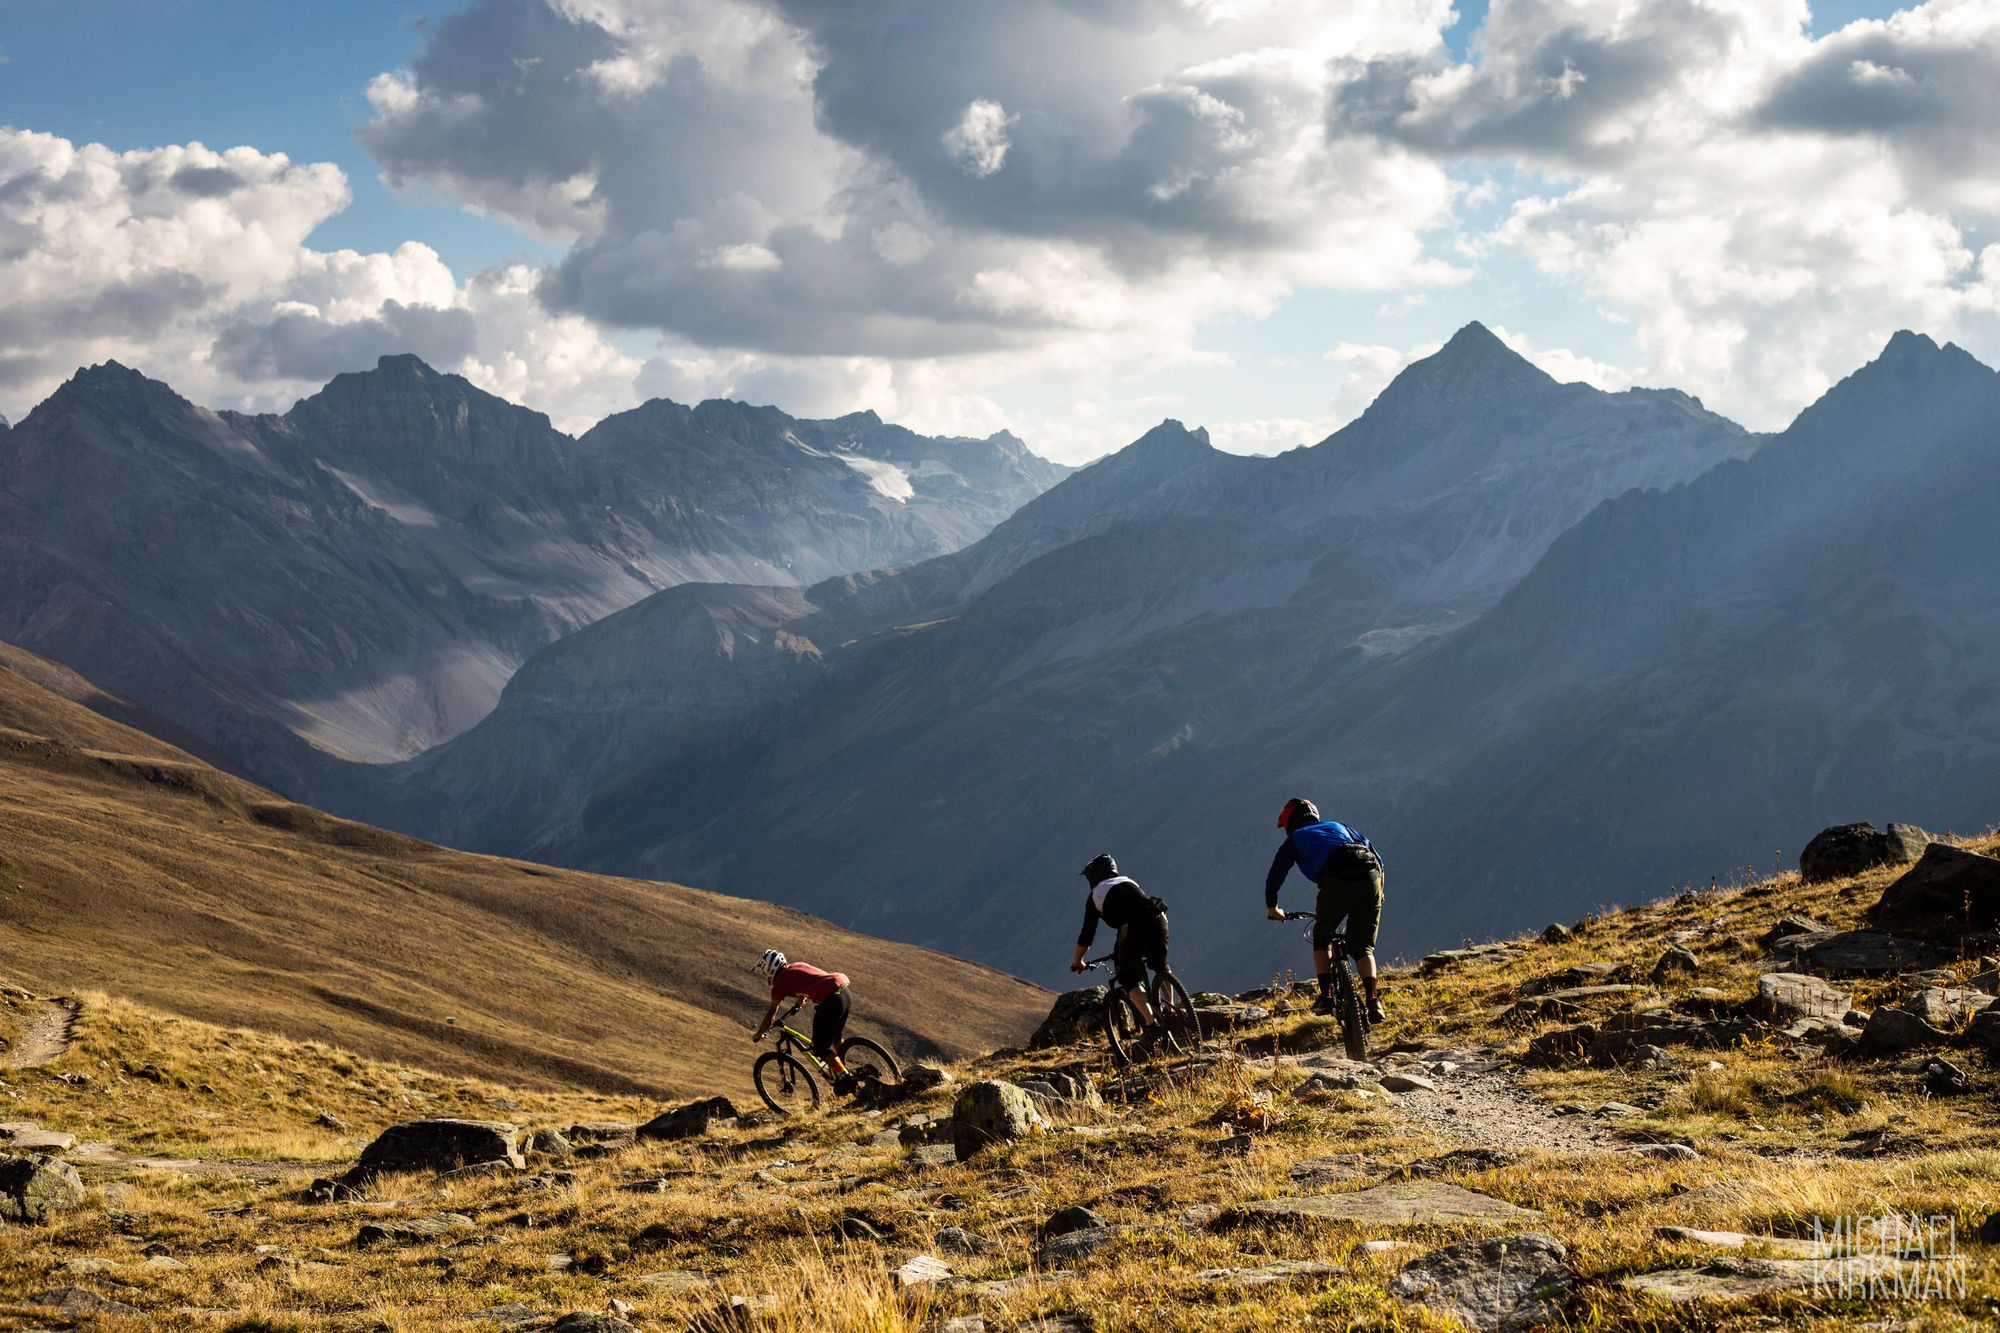 Mondraker Enduro Team: Rennen in Davos kann starten